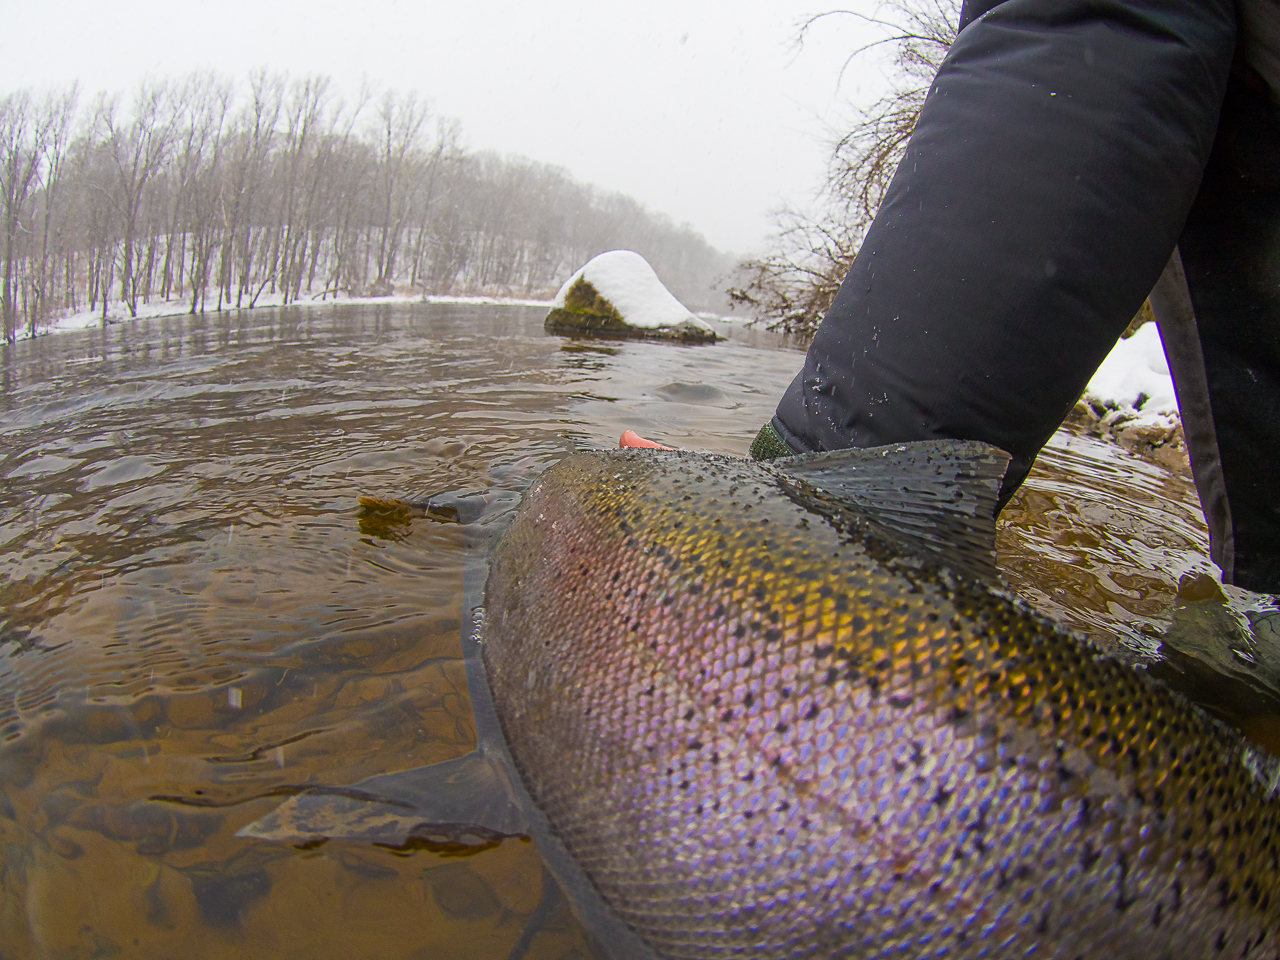 Winter Steelhead Fishing—A Great Way to Enjoy the Muskegon